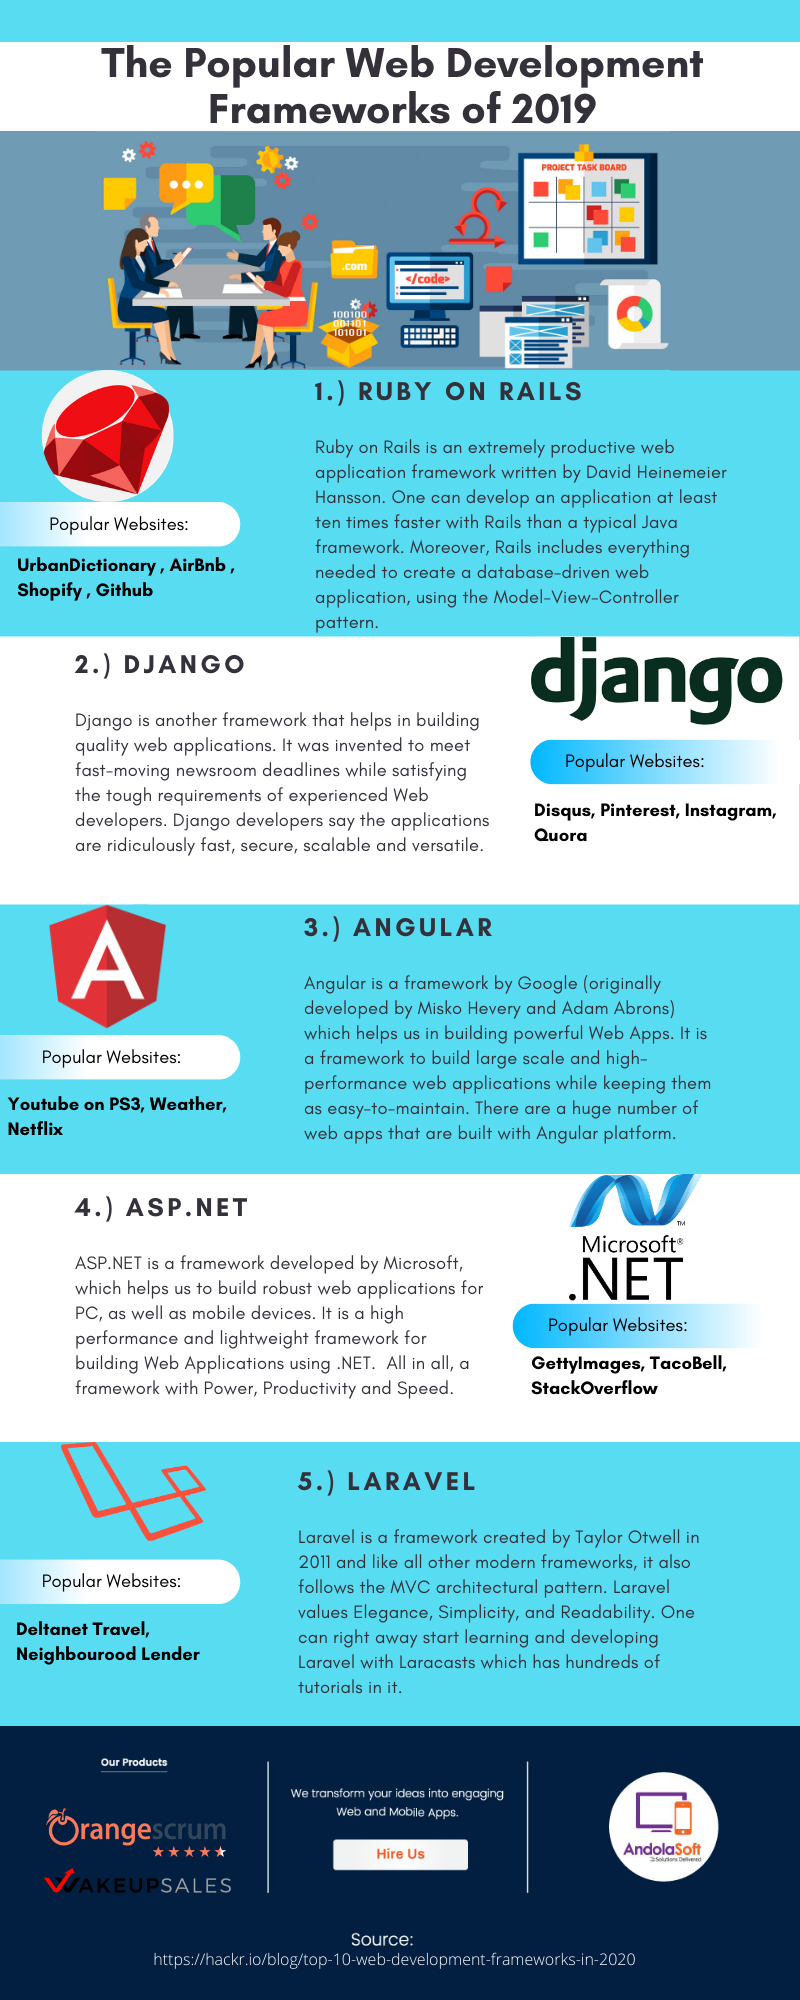 The Popular Web Development Frameworks